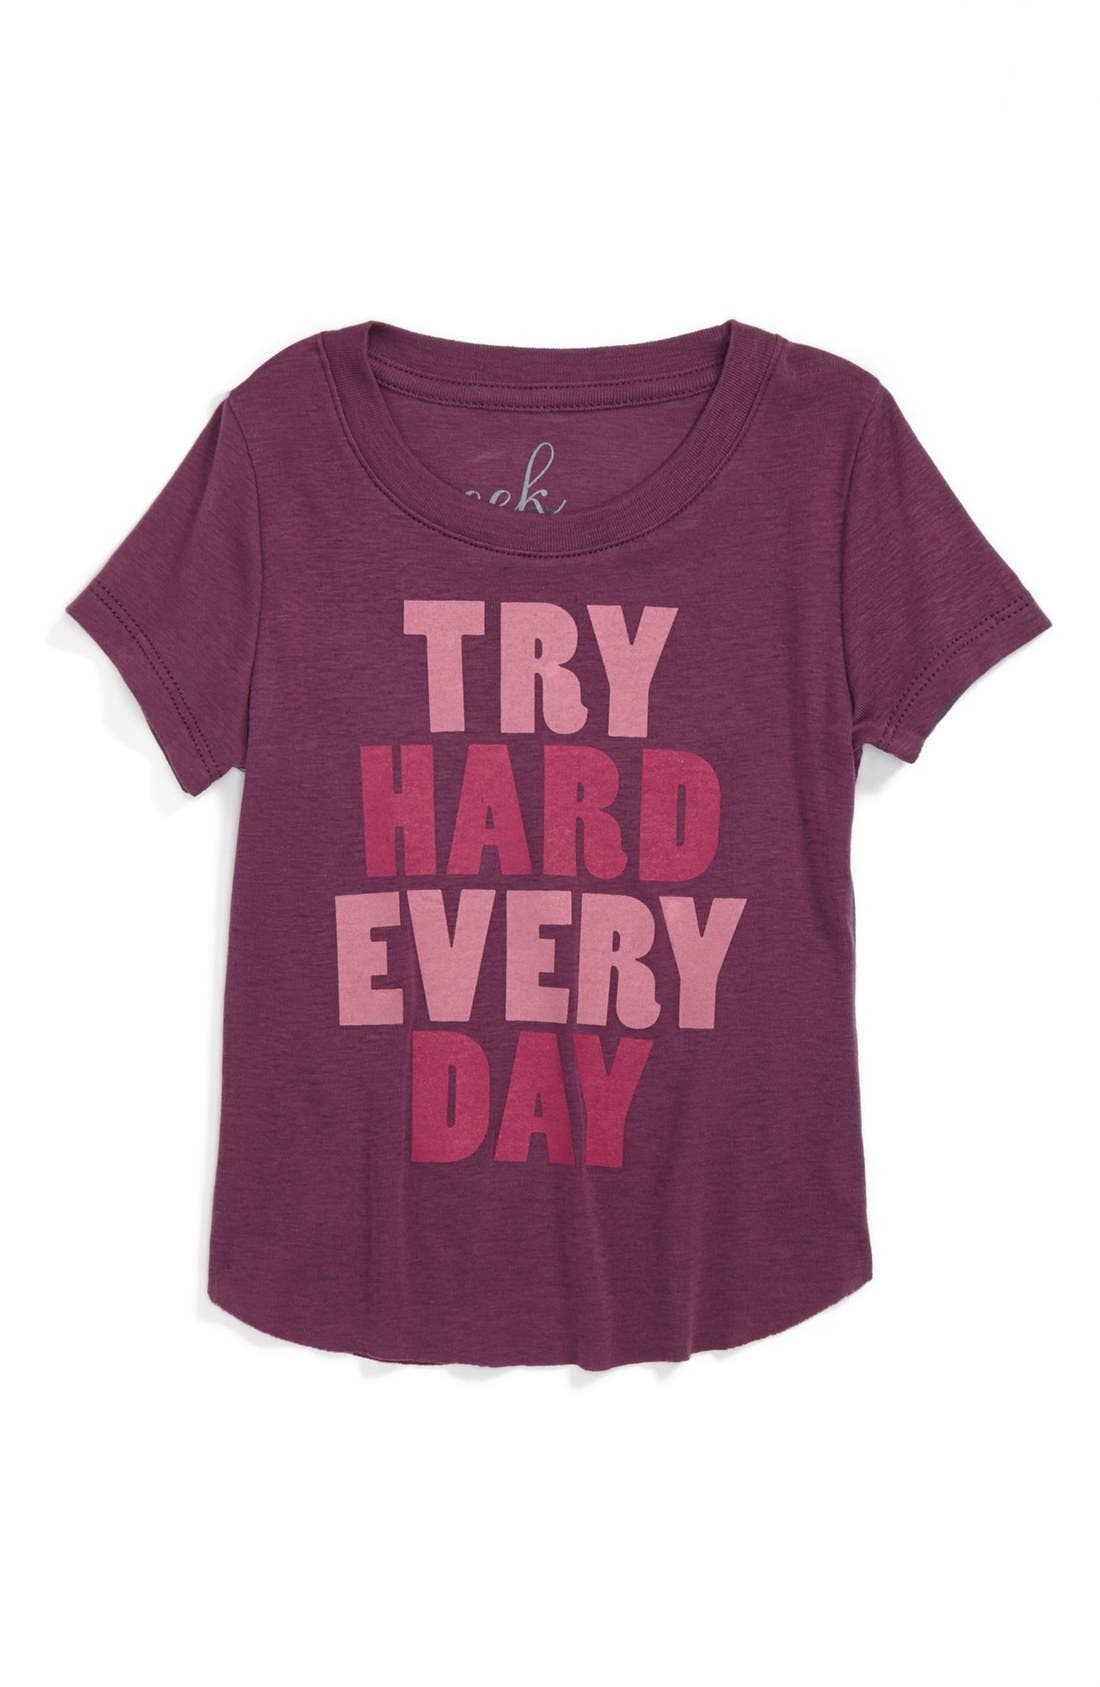 Main Image - Peek 'Try Hard Every Day' Tee (Baby Girls)